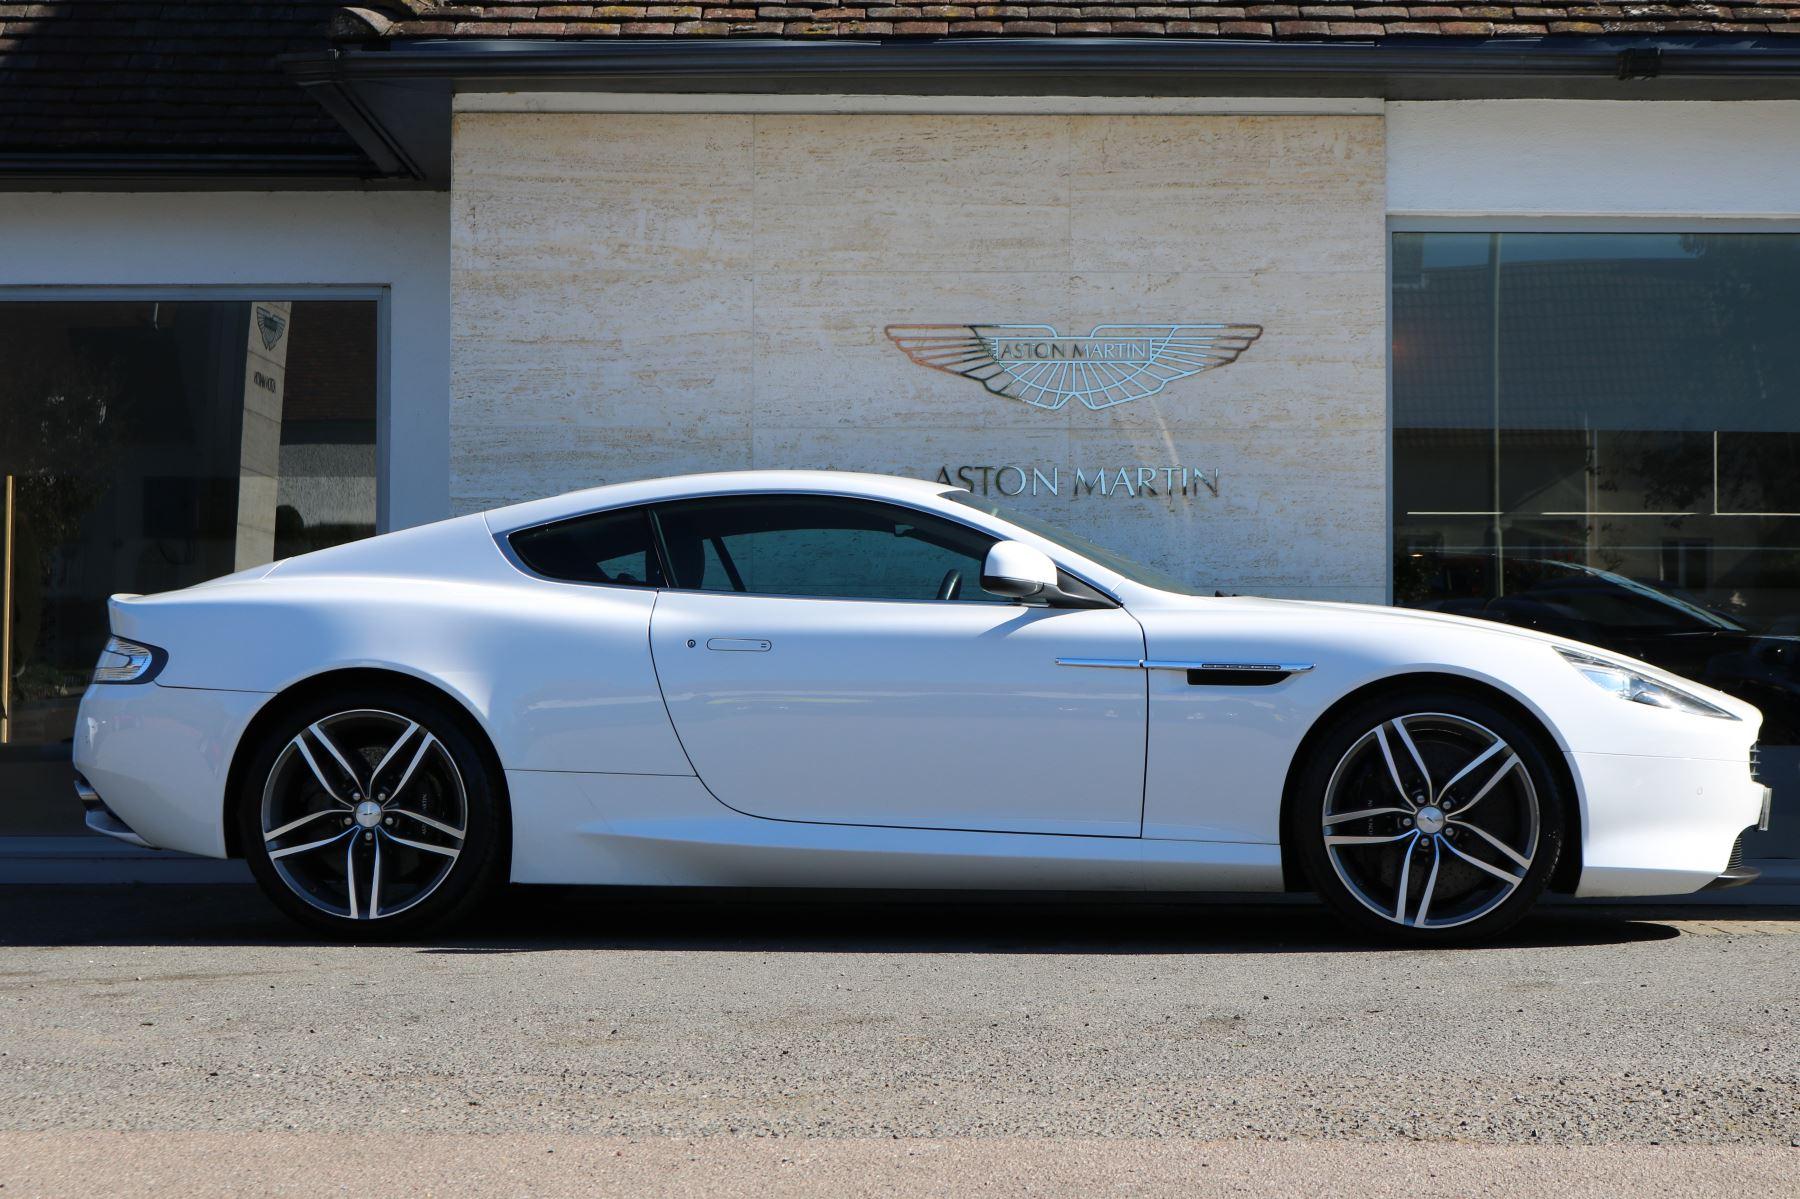 Aston Martin DB9 V12 2dr Touchtronic image 4